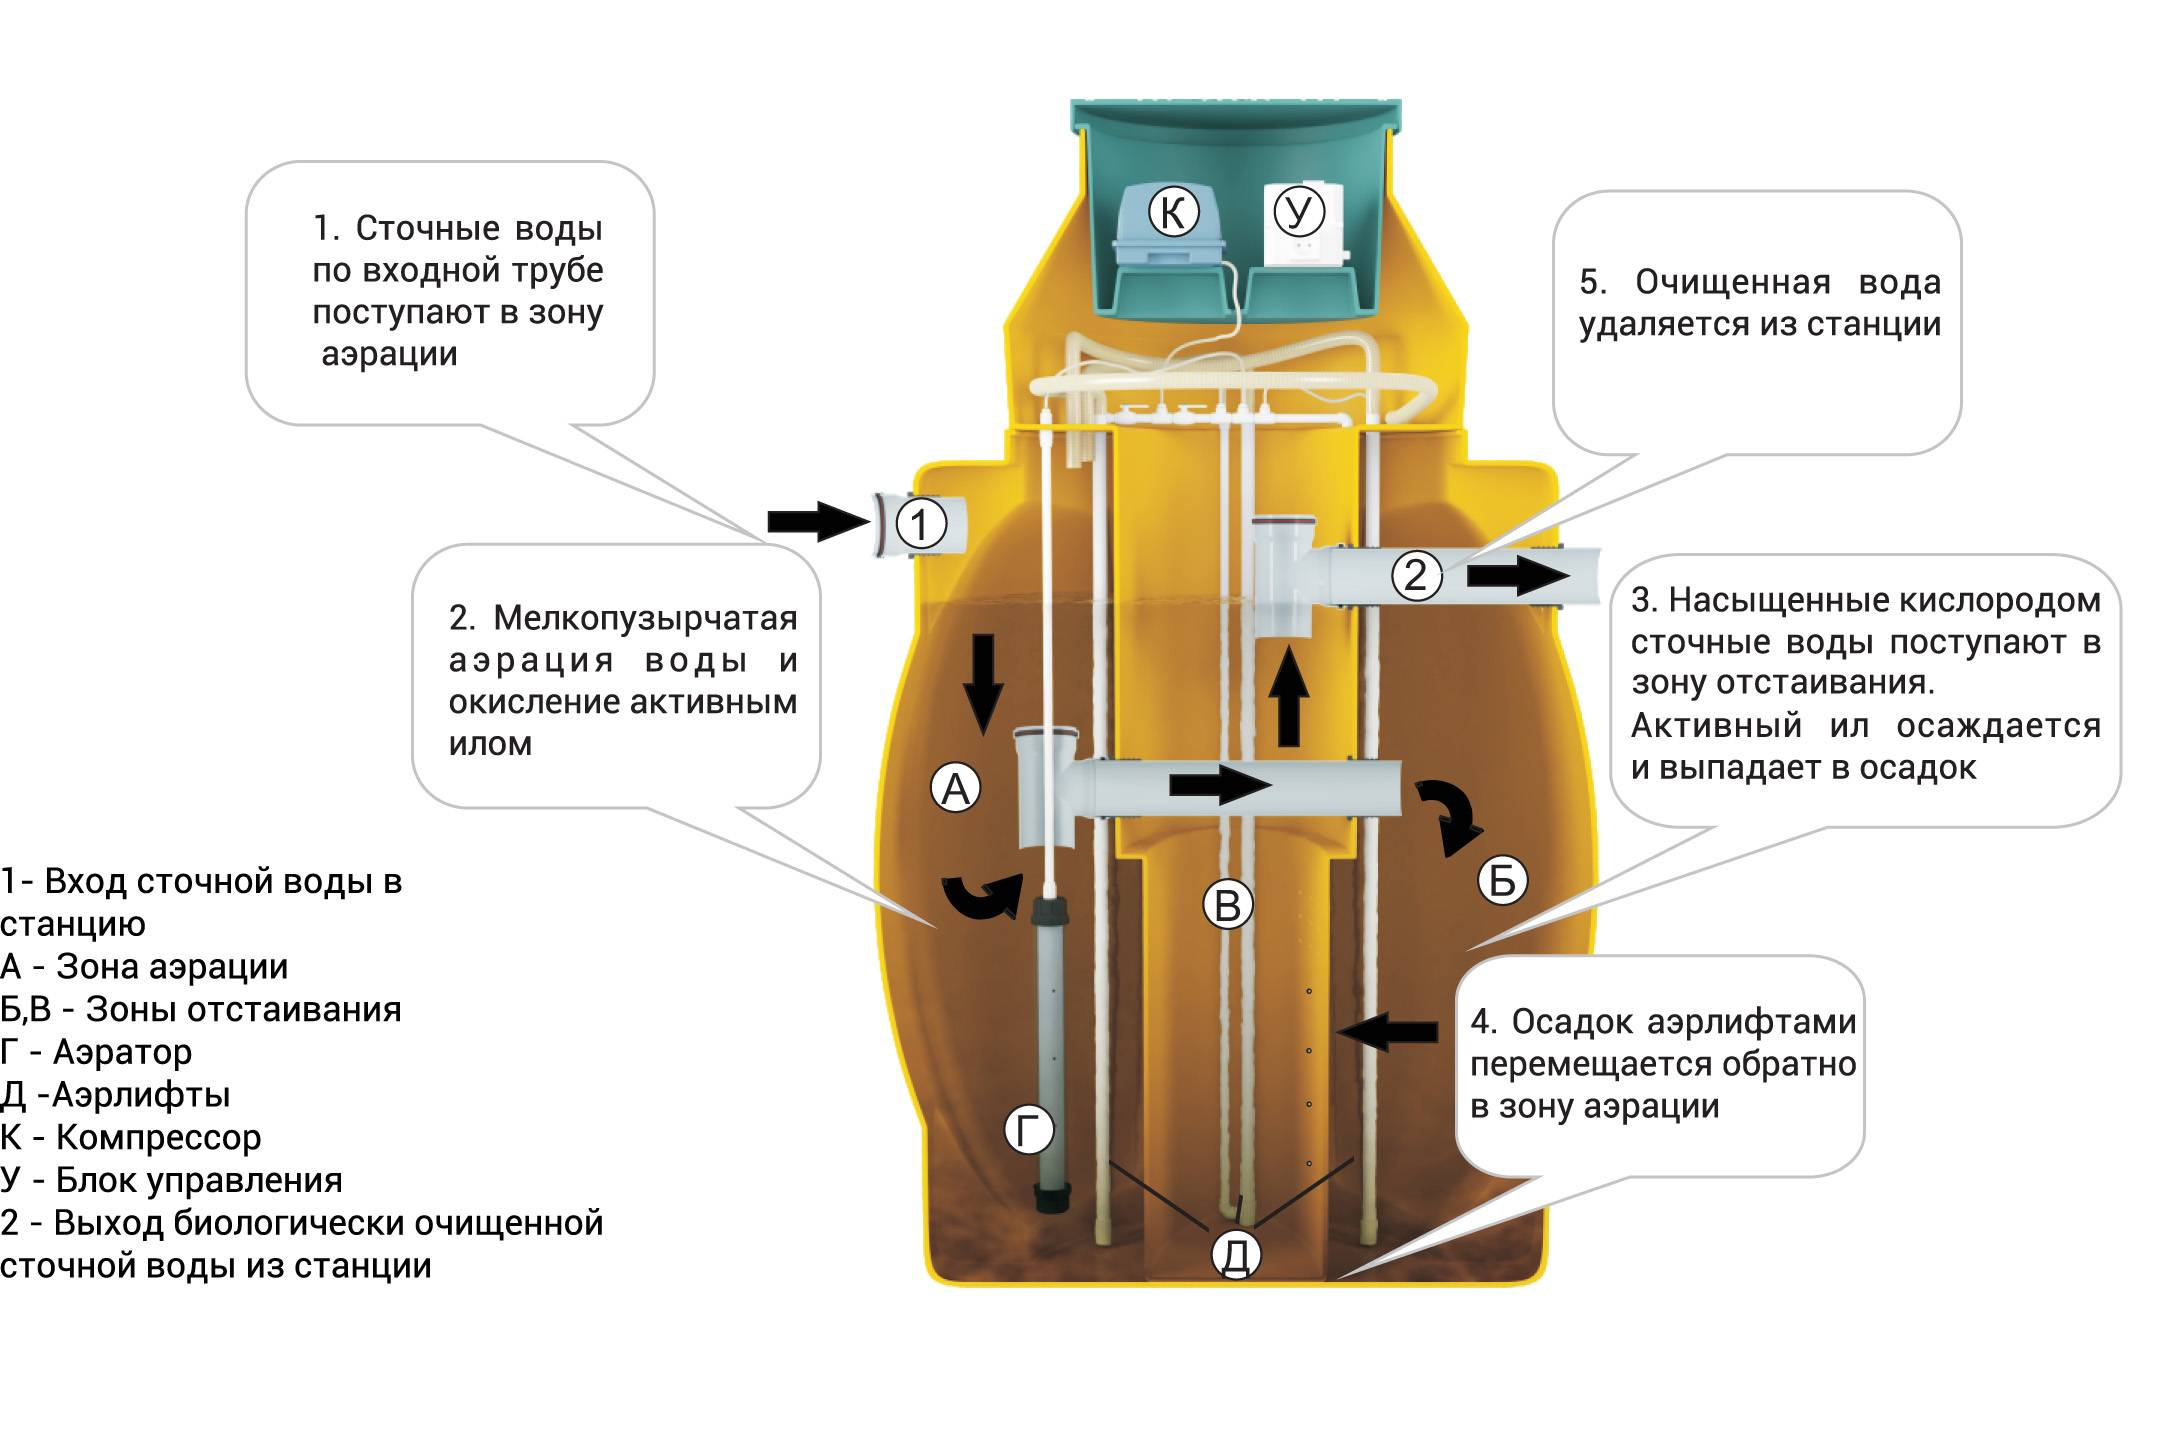 Преимущества септика ак-47 и особенности его установки своими руками